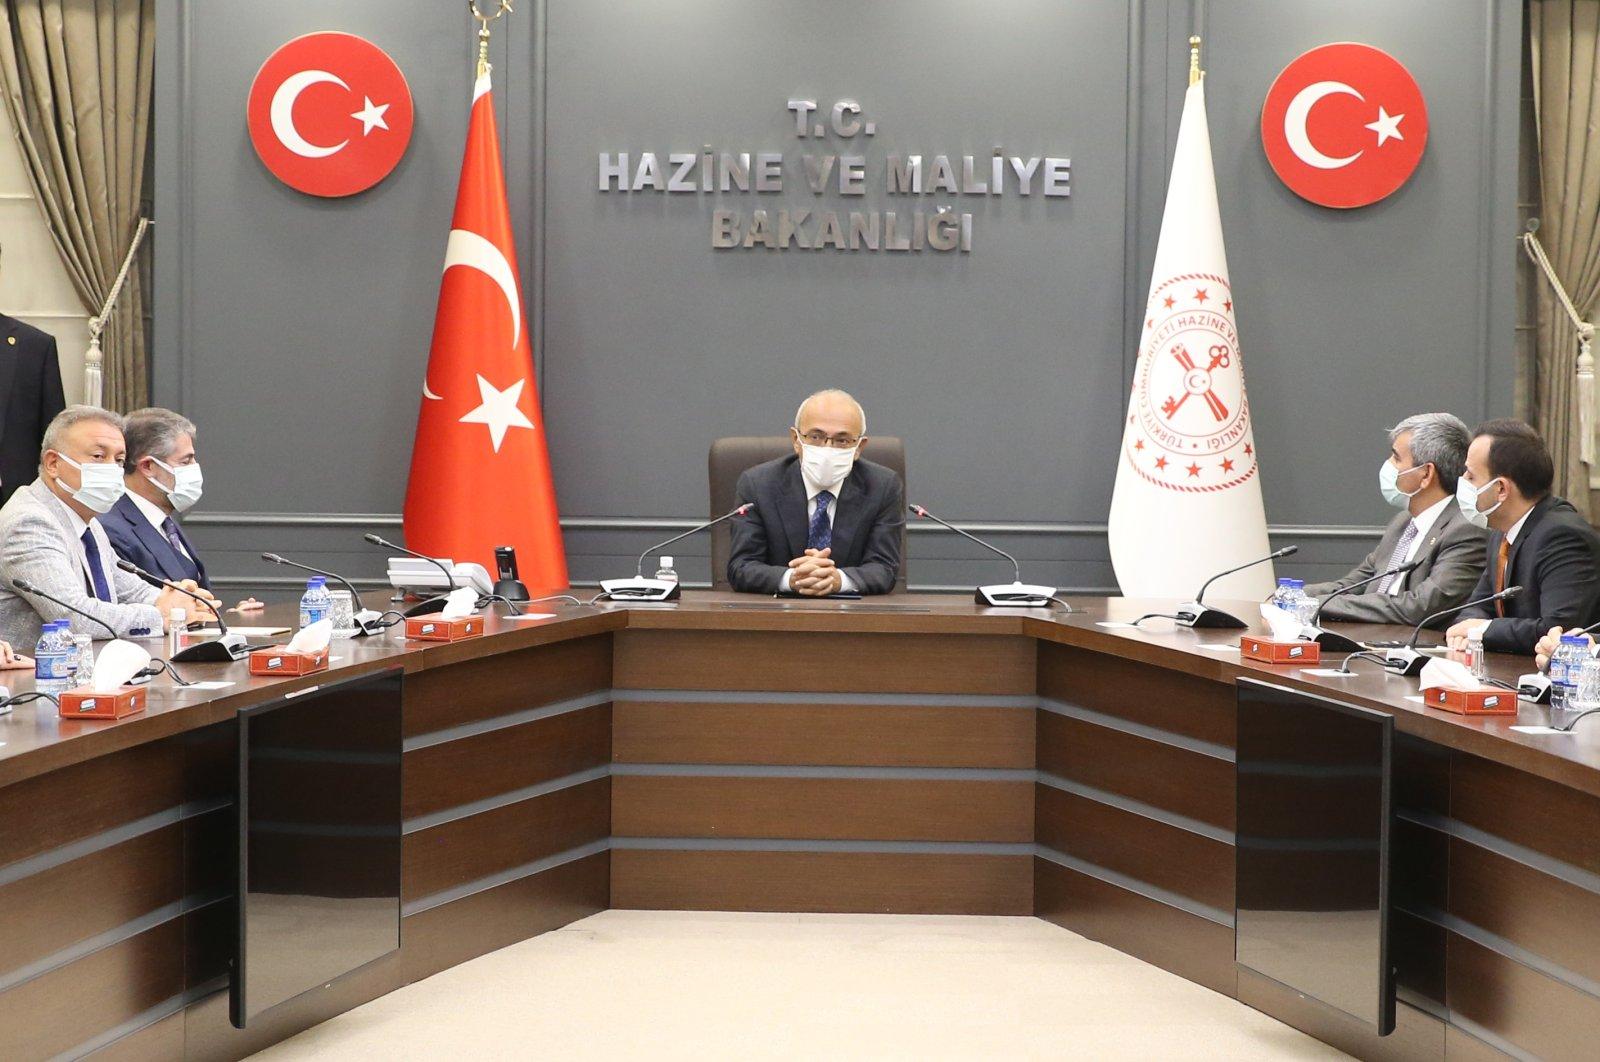 Treasury and Finance Minister Lütfi Elvan at the ministry headquarters in the capital Ankara, Turkey, Nov. 10, 2020. (AA Photo)